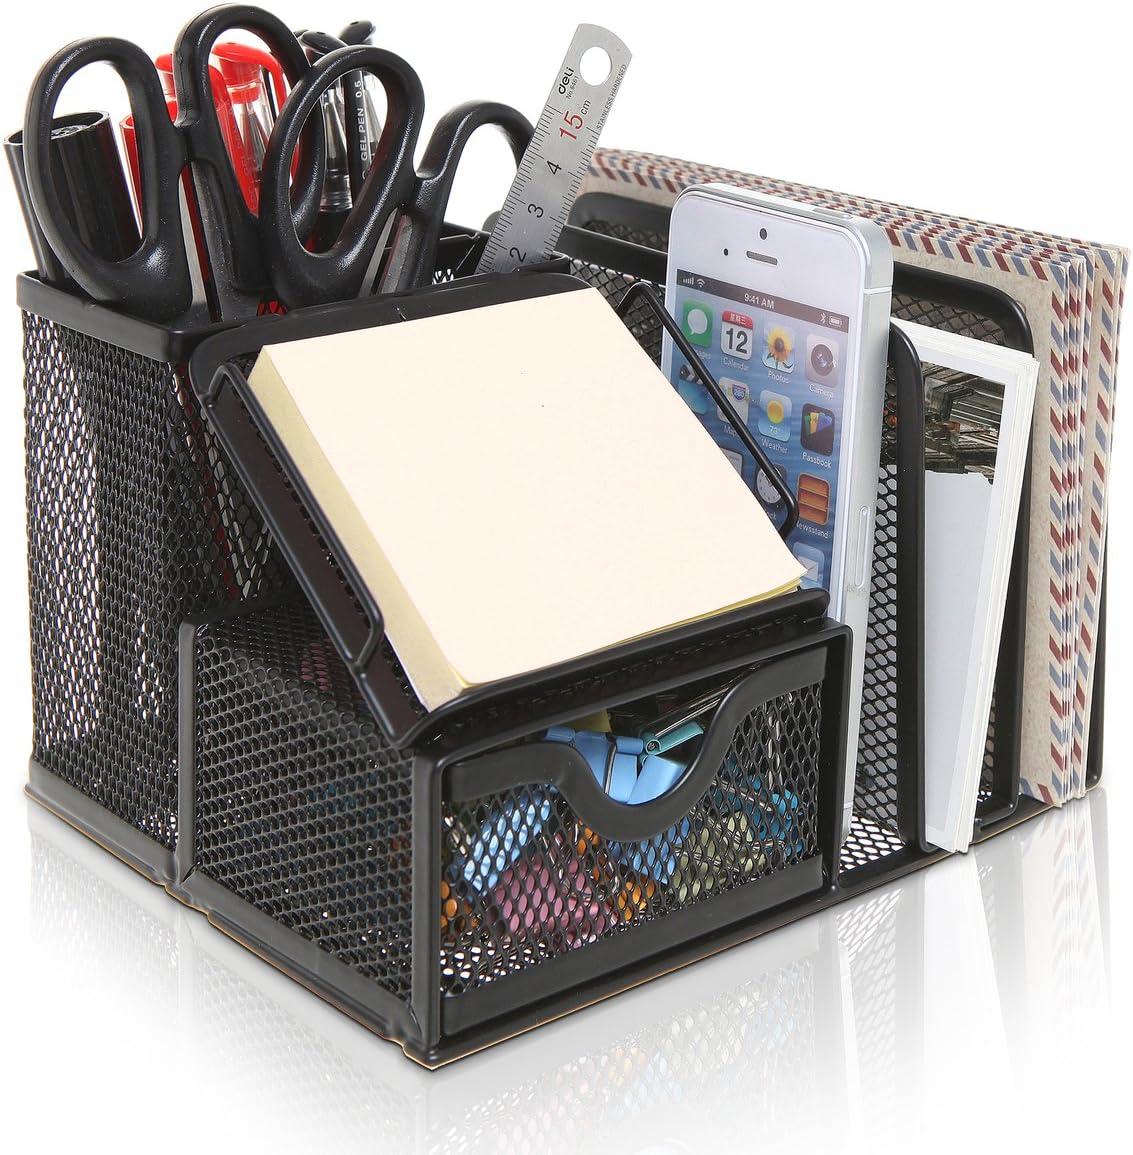 MyGift Metal Mesh Office Supplies Storage Rack, Mail Organizer, Post It Note Memo Pad Holder, Black